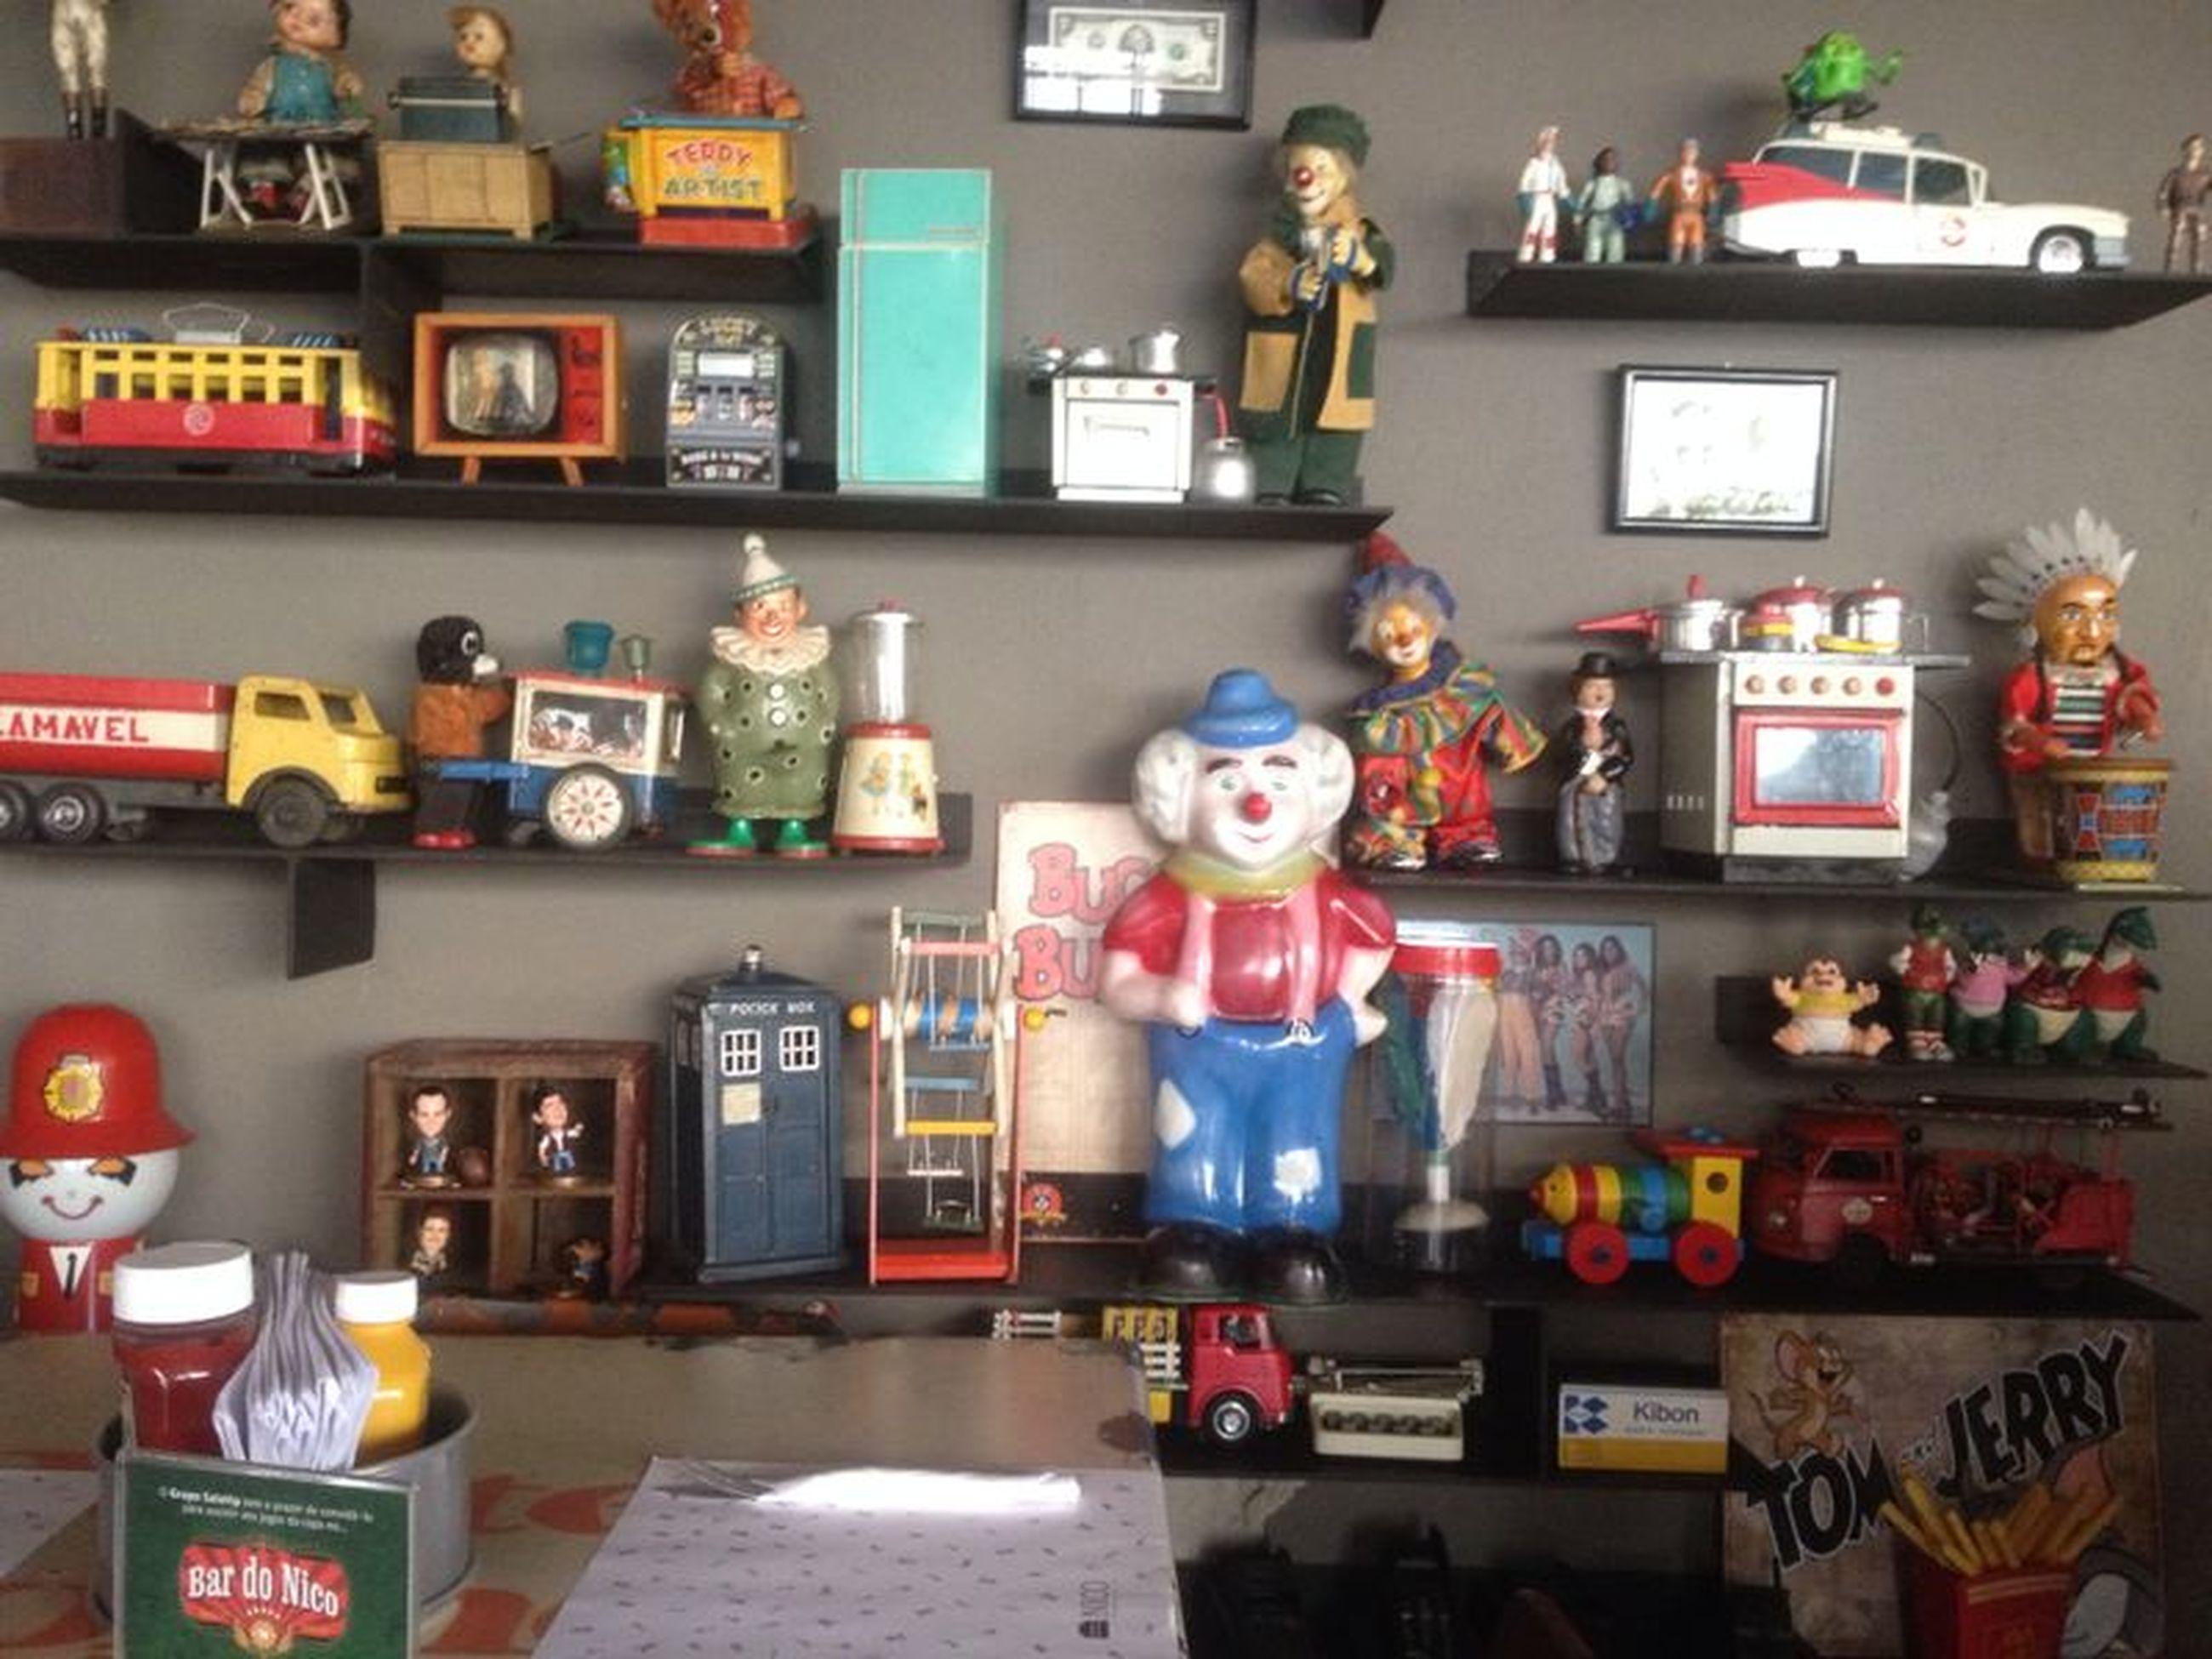 human representation, art, art and craft, creativity, indoors, statue, animal representation, text, store, sculpture, toy, communication, figurine, retail, variation, shop, mannequin, display